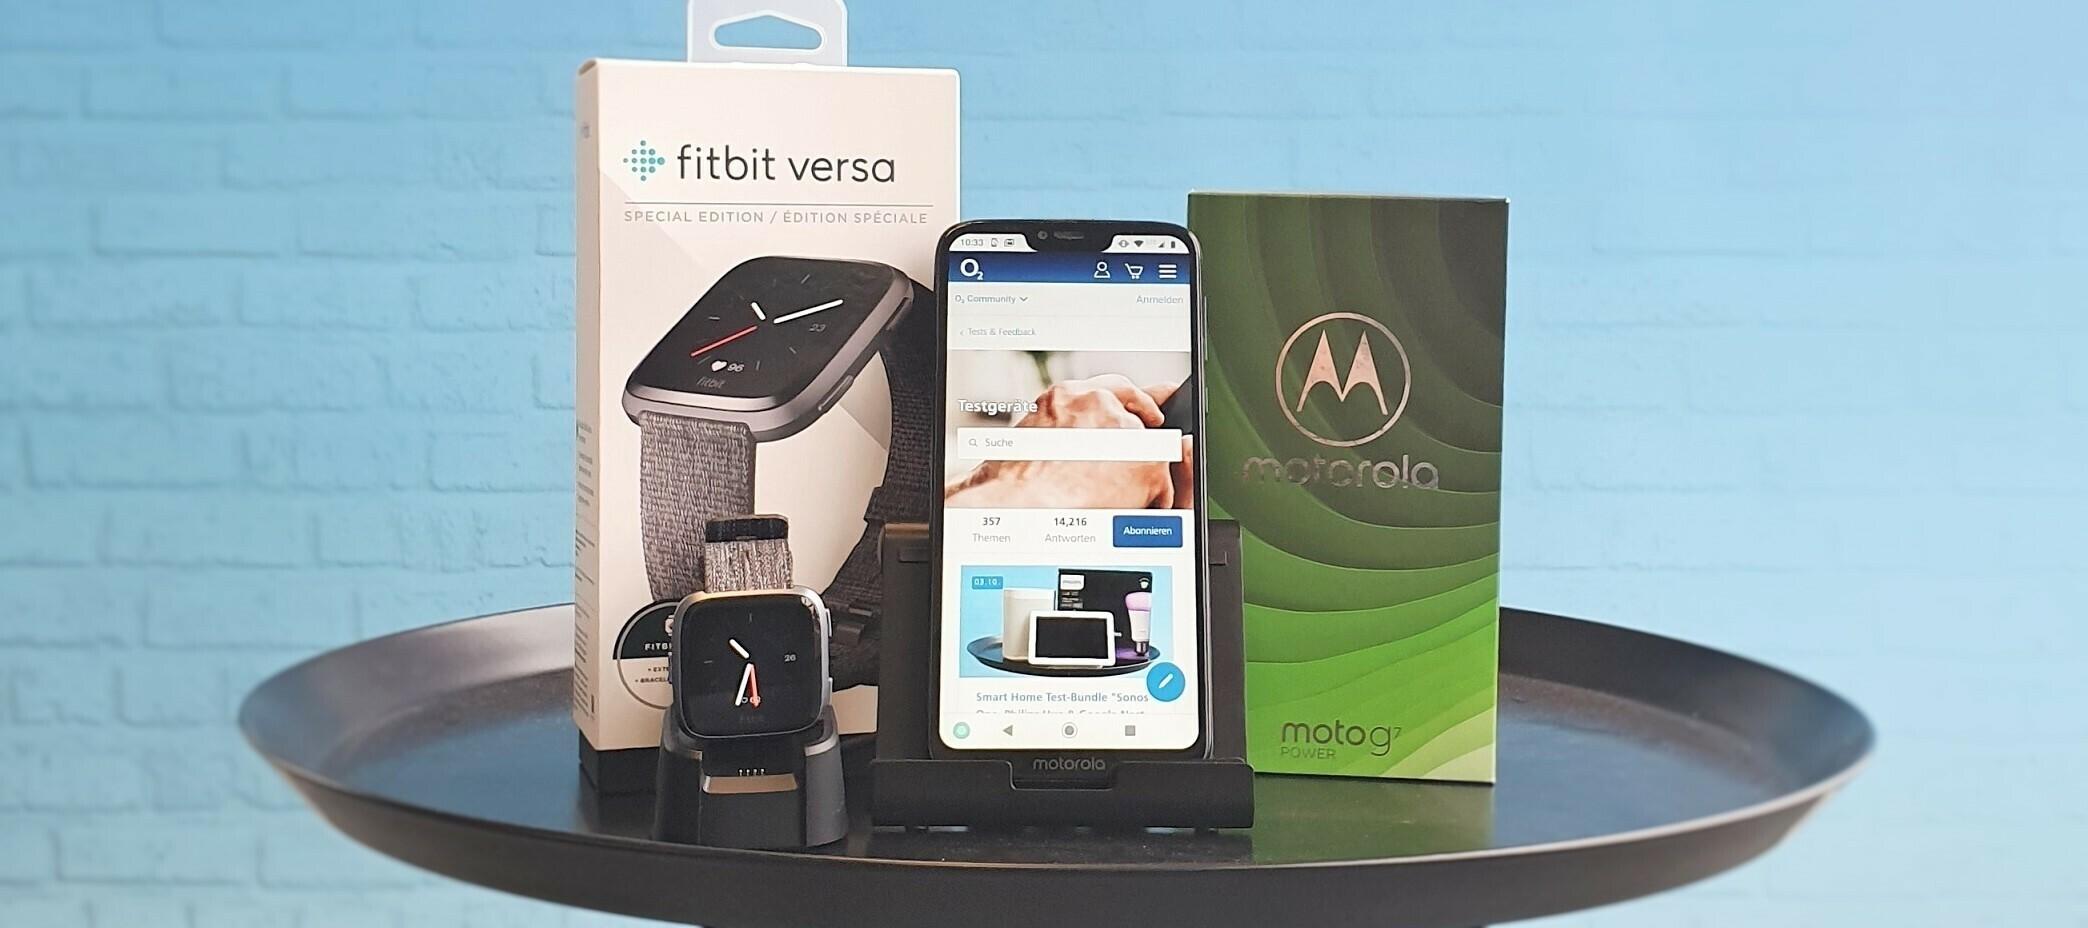 Motorola Moto G7 Power & Fitbit Versa Special Edition - Super-Power-Fitness-Testbundle!